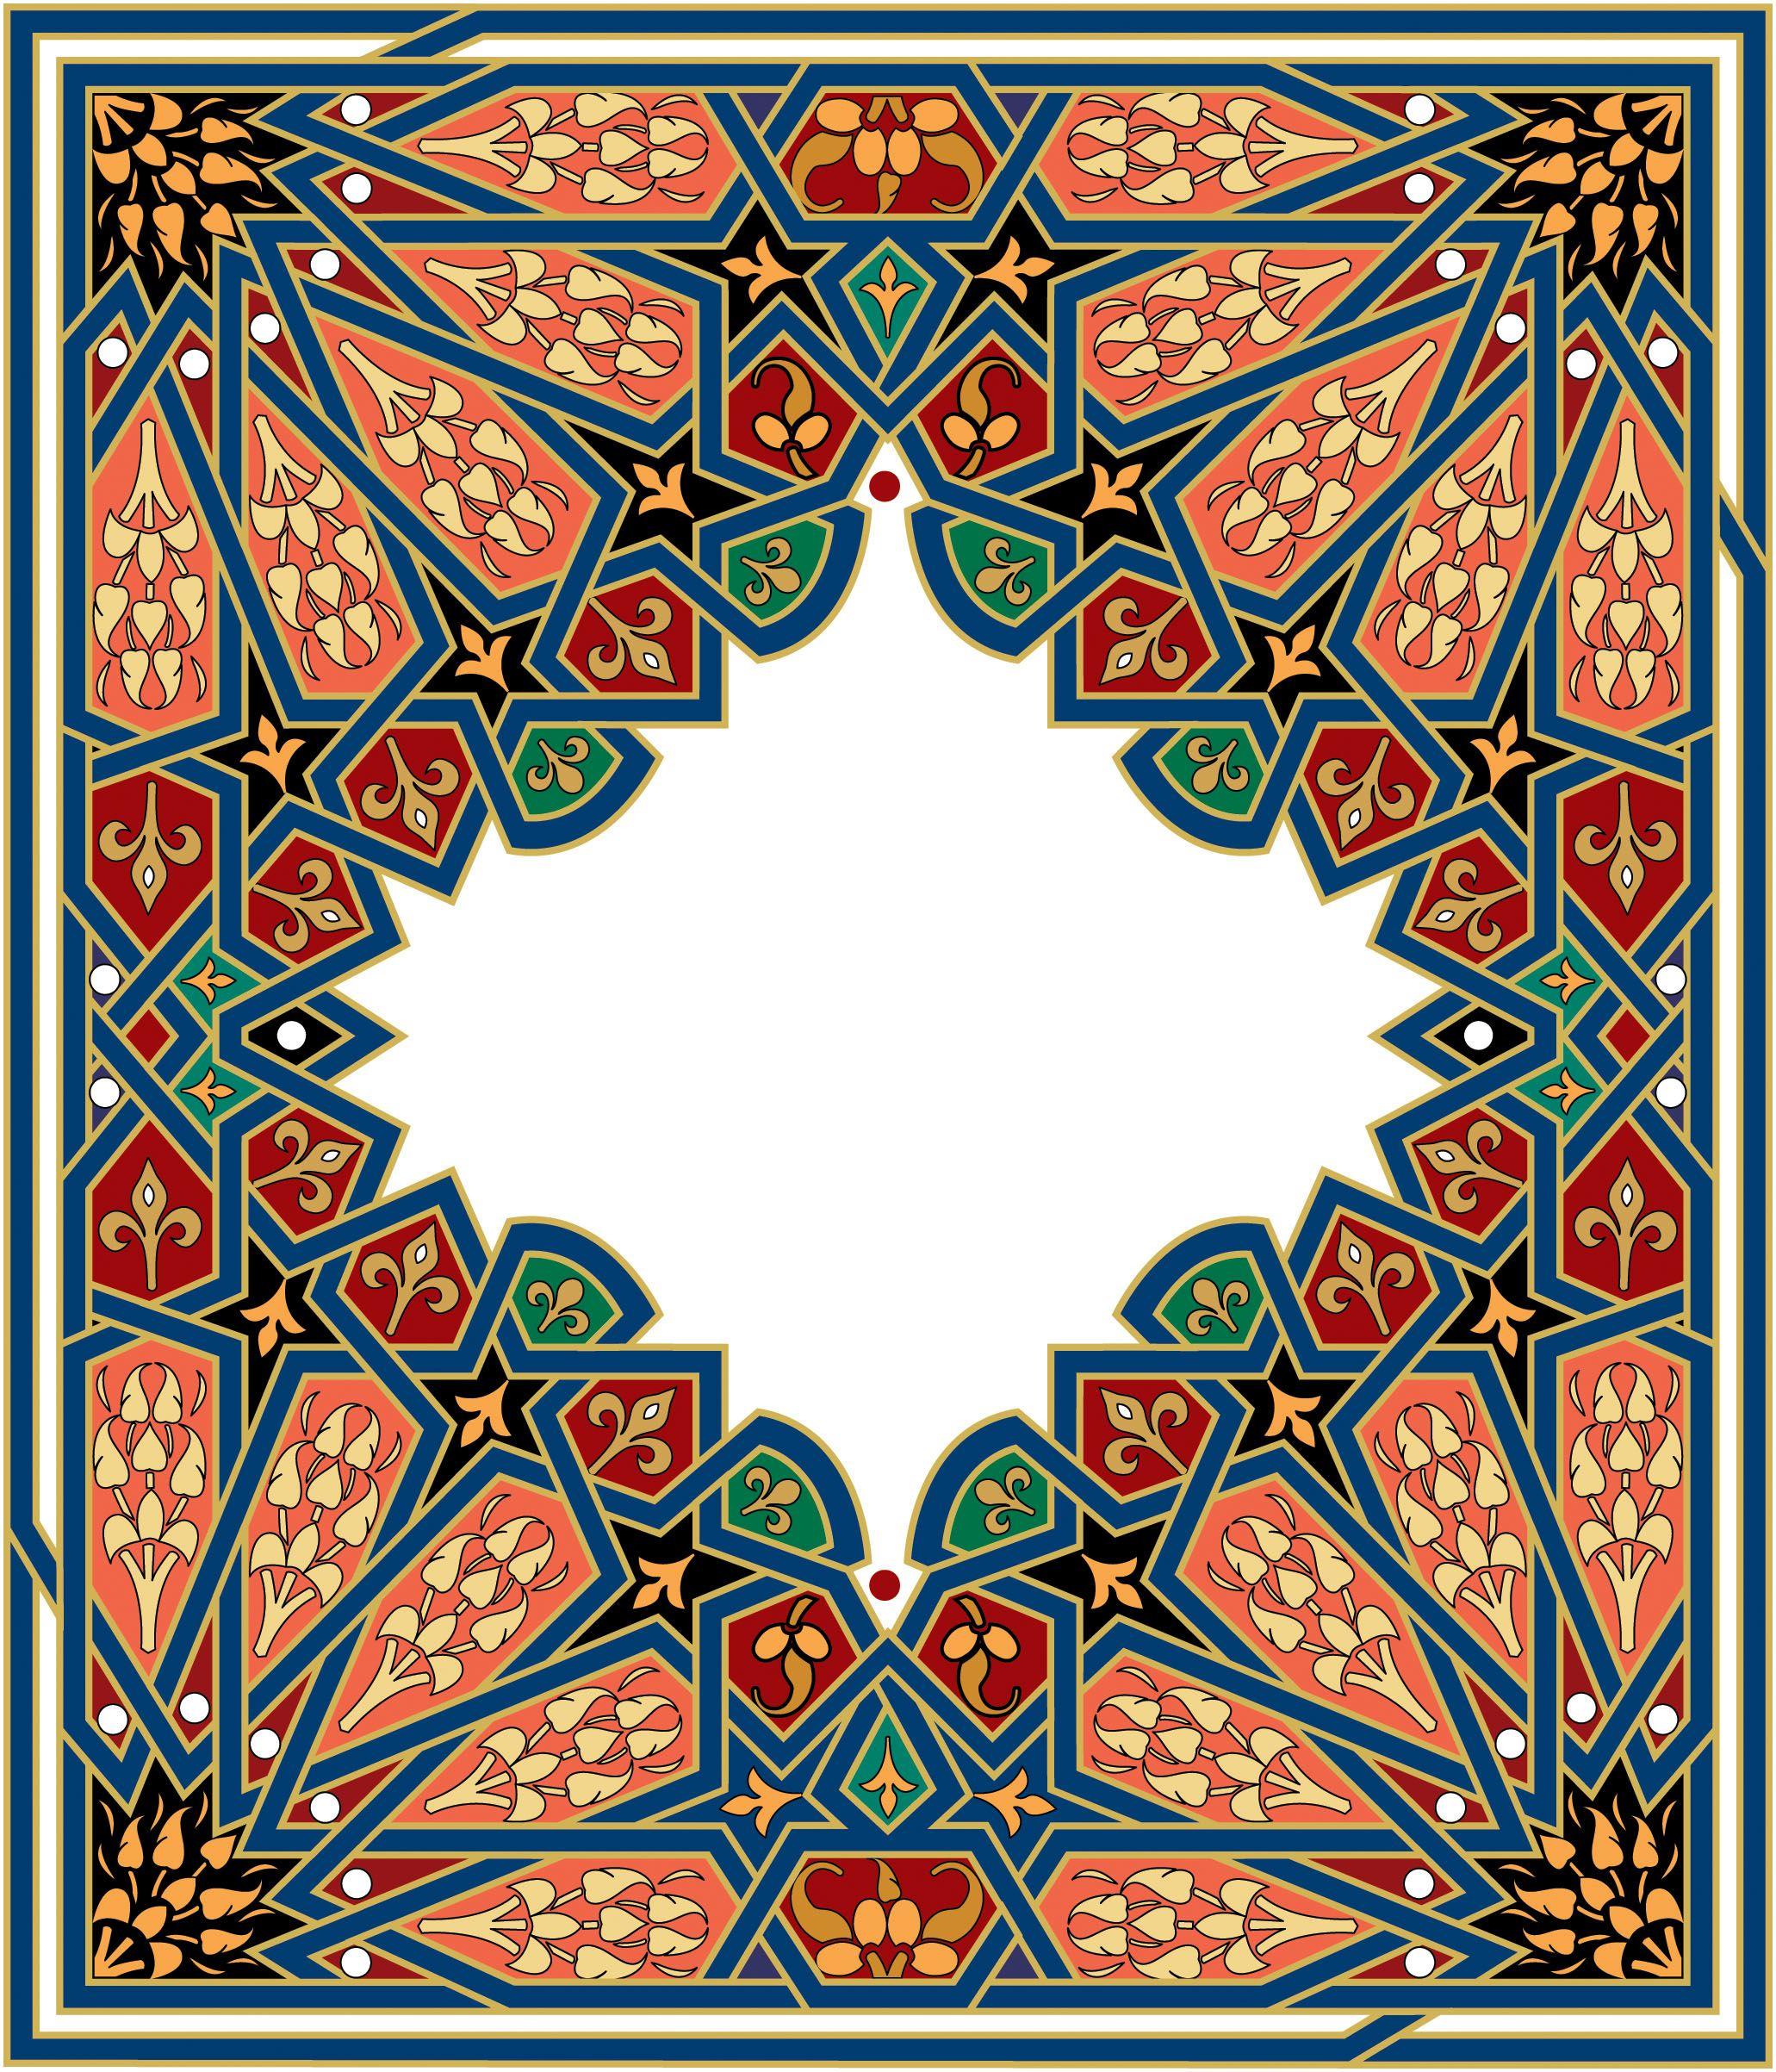 Shiagraph Category Arabesque Islamic Art Image 18 Arabesque Islamic Art Islamic Art Pattern Geometric Art Pattern Art